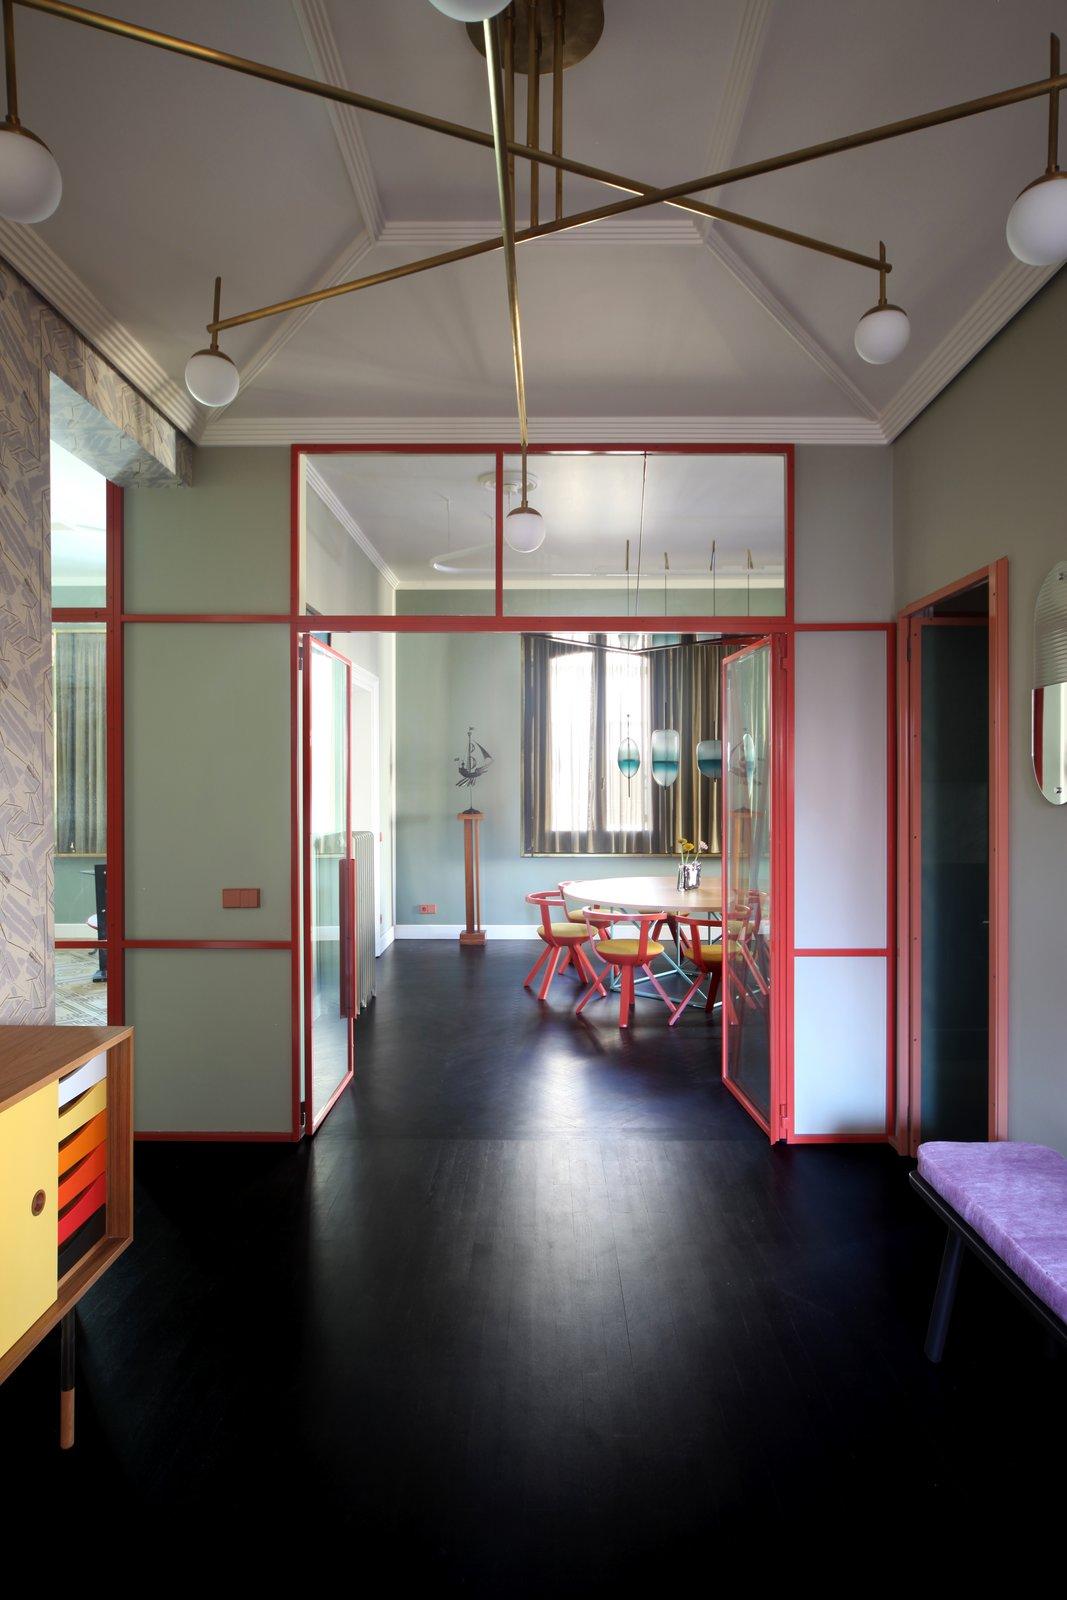 Hallway and Dark Hardwood Floor Apartment entrance:  Photo 7 of 24 in This Venetian Apartment Is Bursting With Incredible European Furnishings